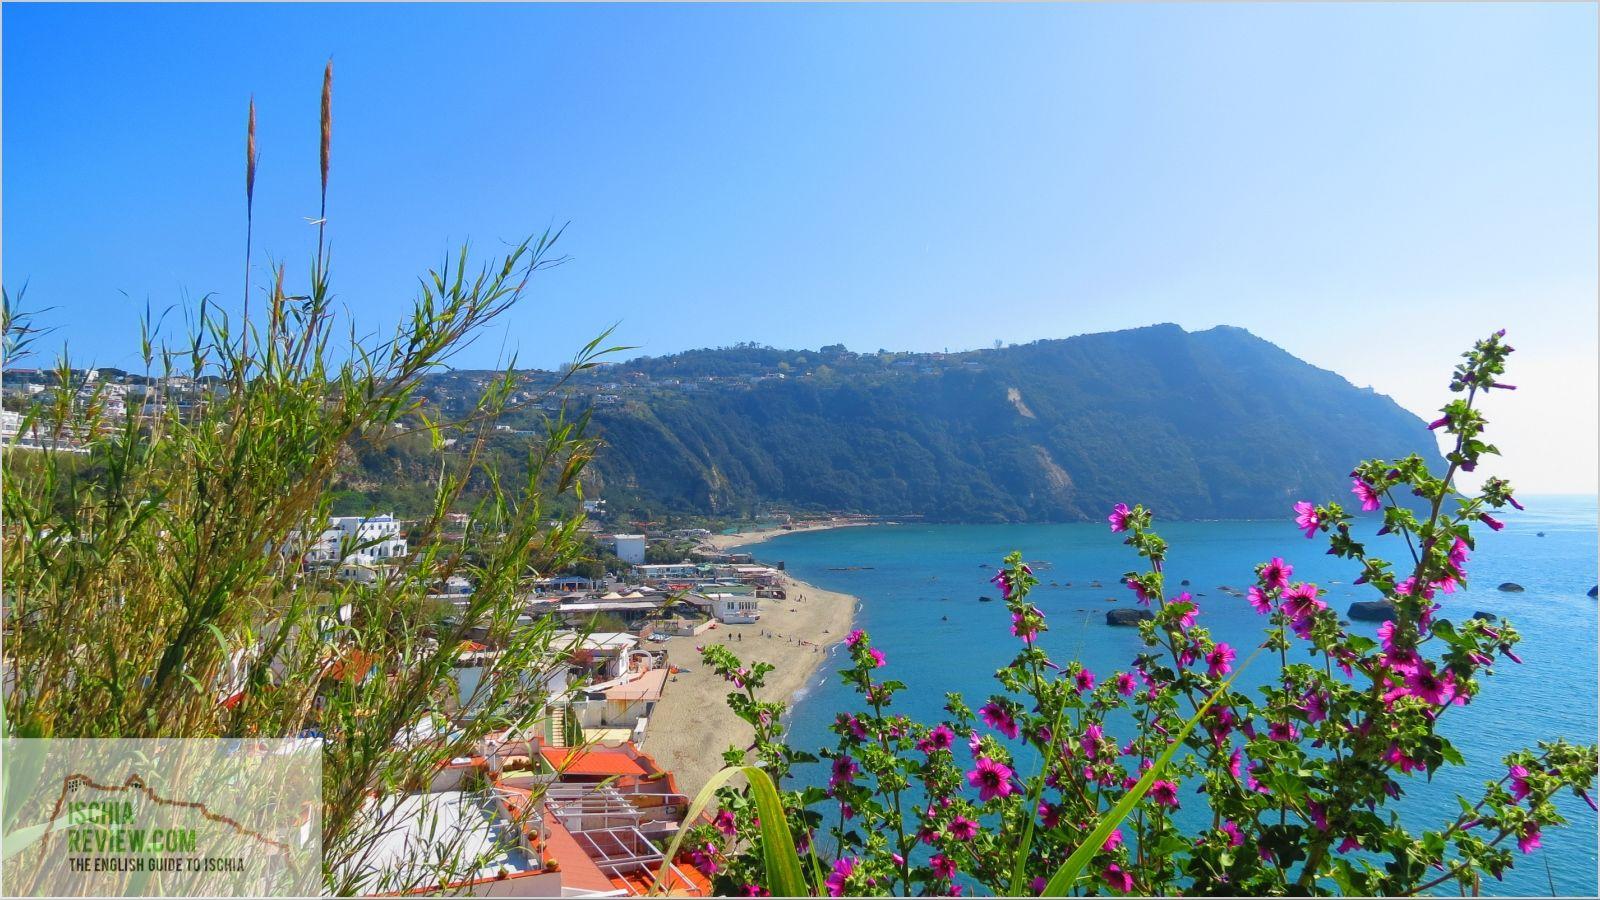 Citara Beach, Forio d'Ischia Ischia, Italy, Travel